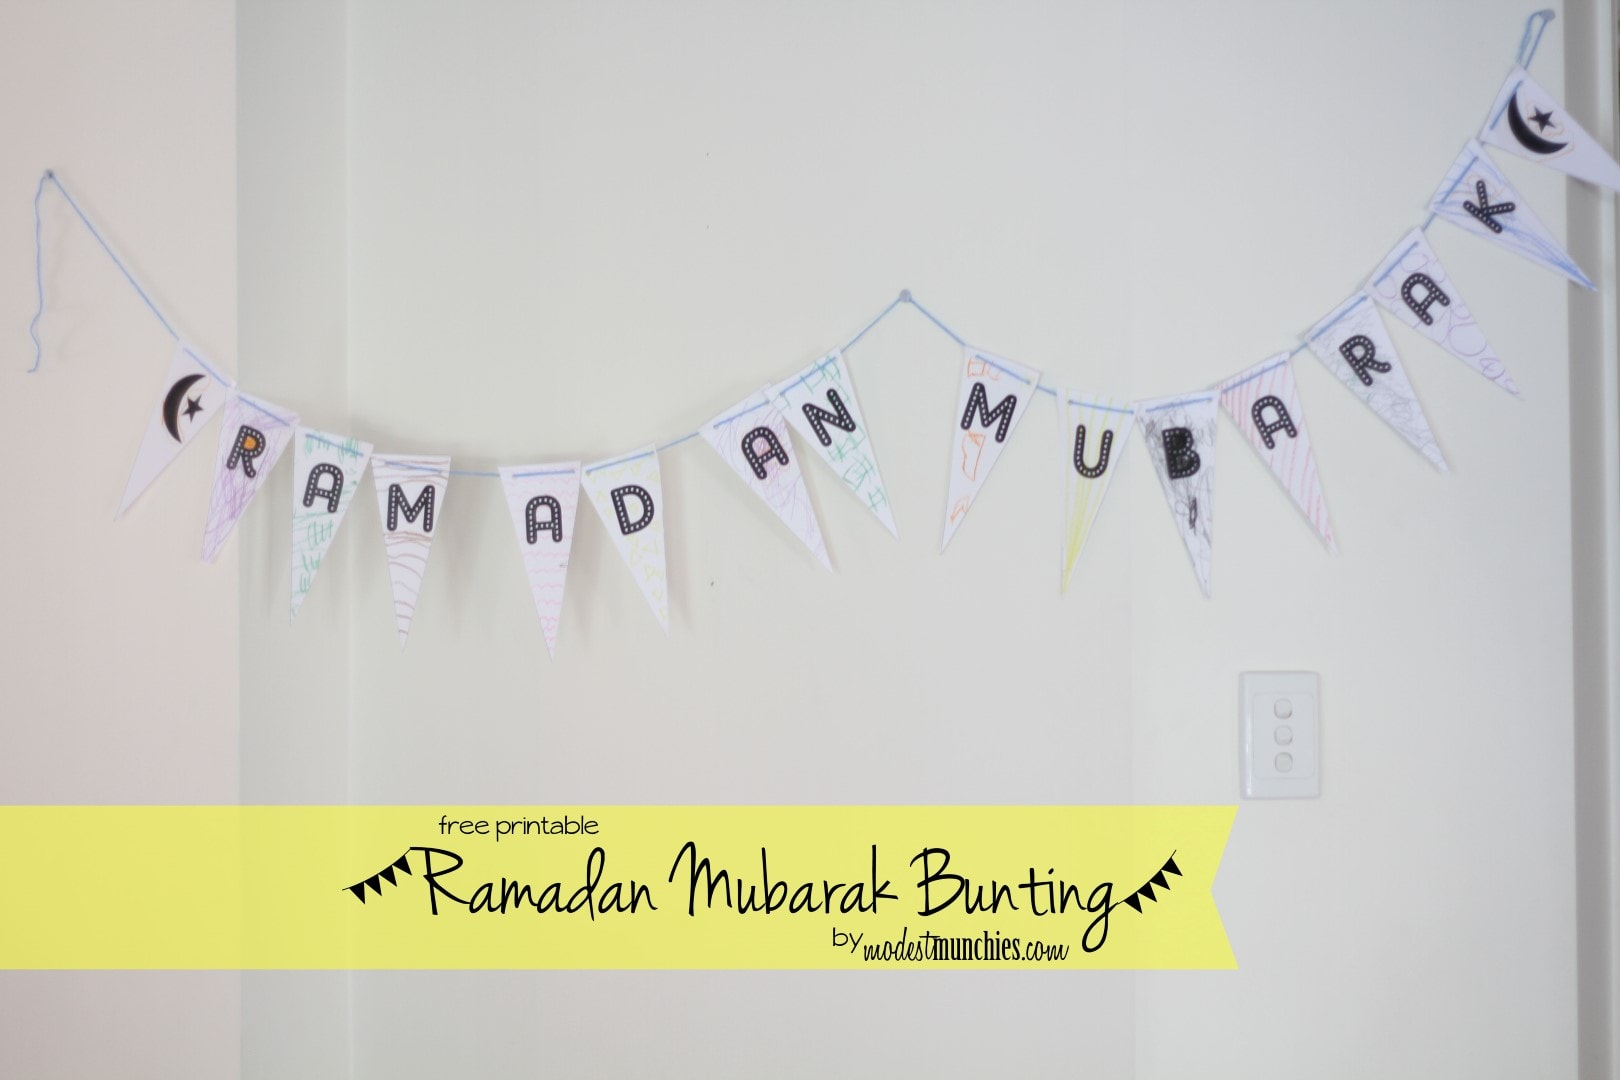 Ramadan Mubarak Bunting Printable (Large)